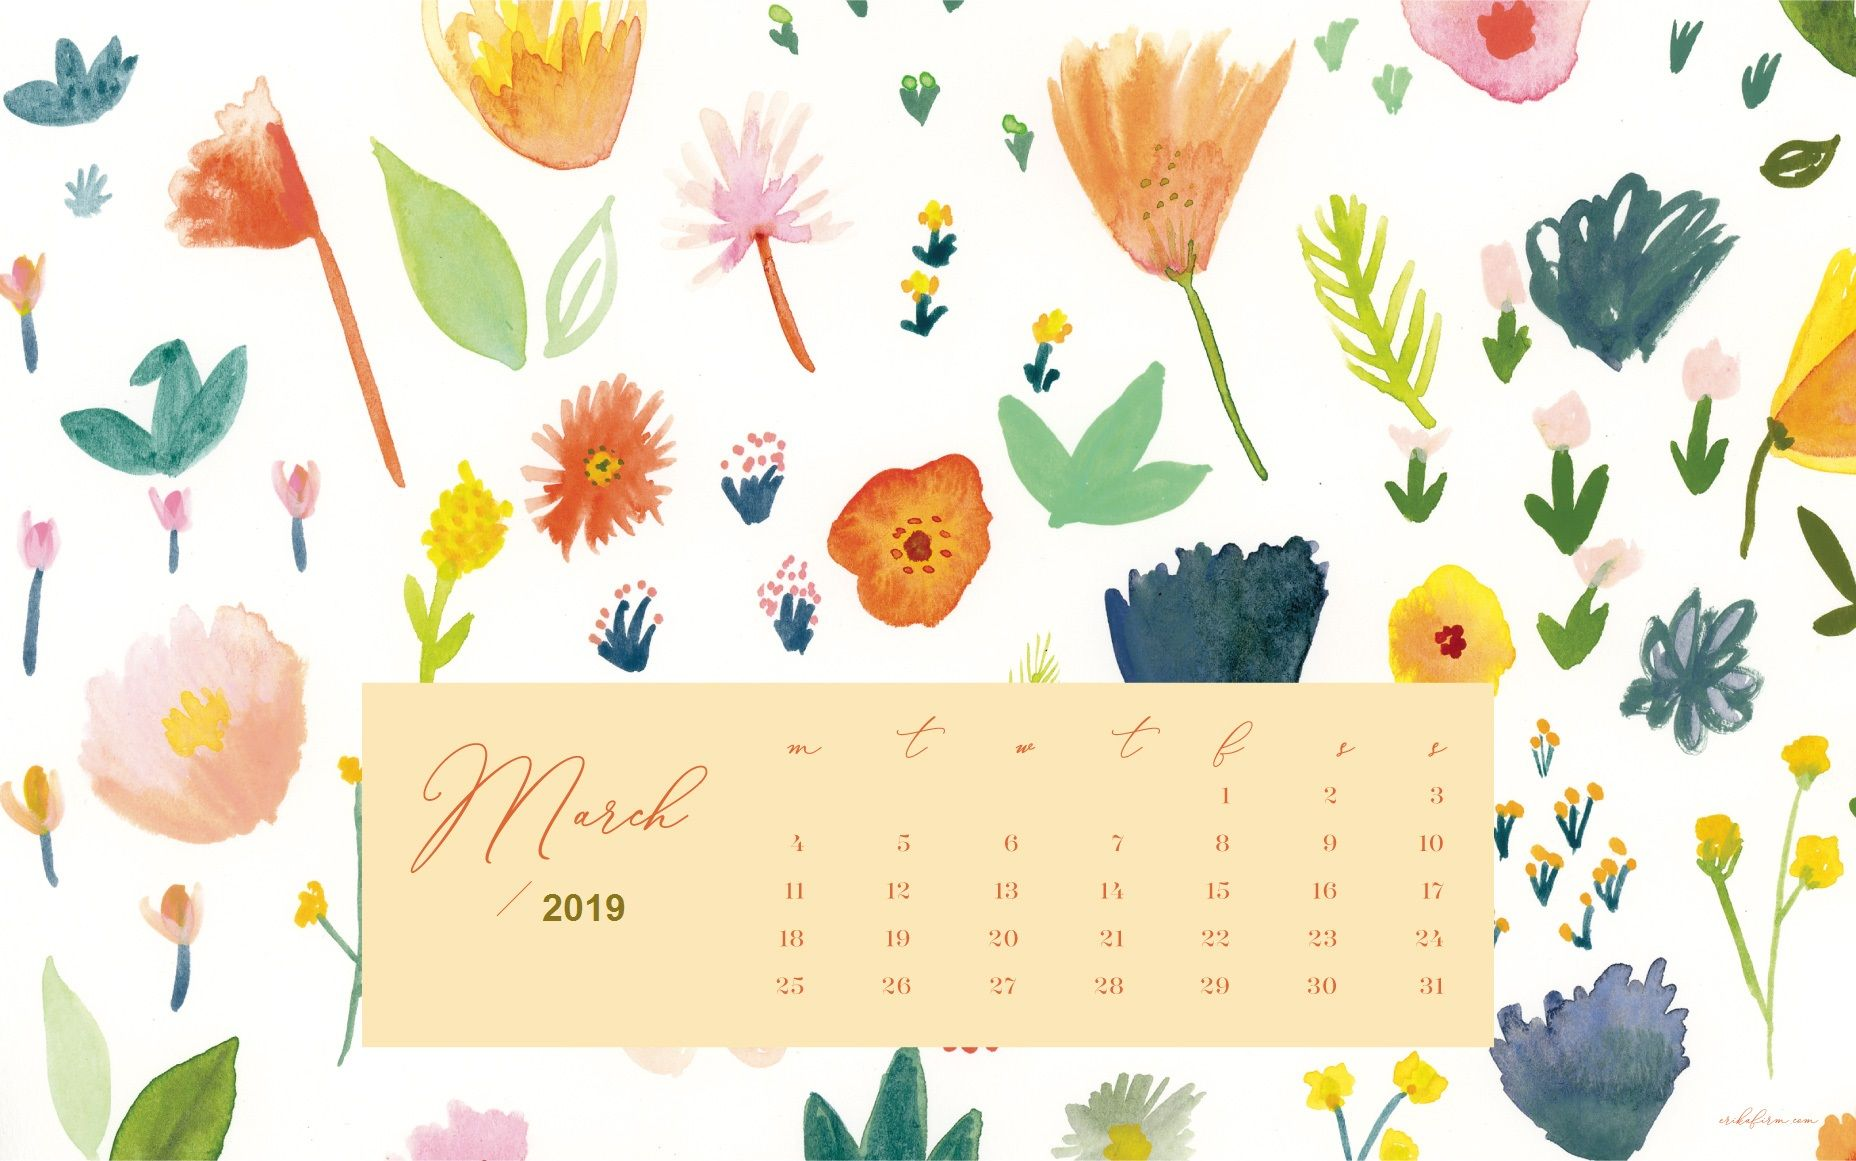 Floral March 2019 Desk Calendar